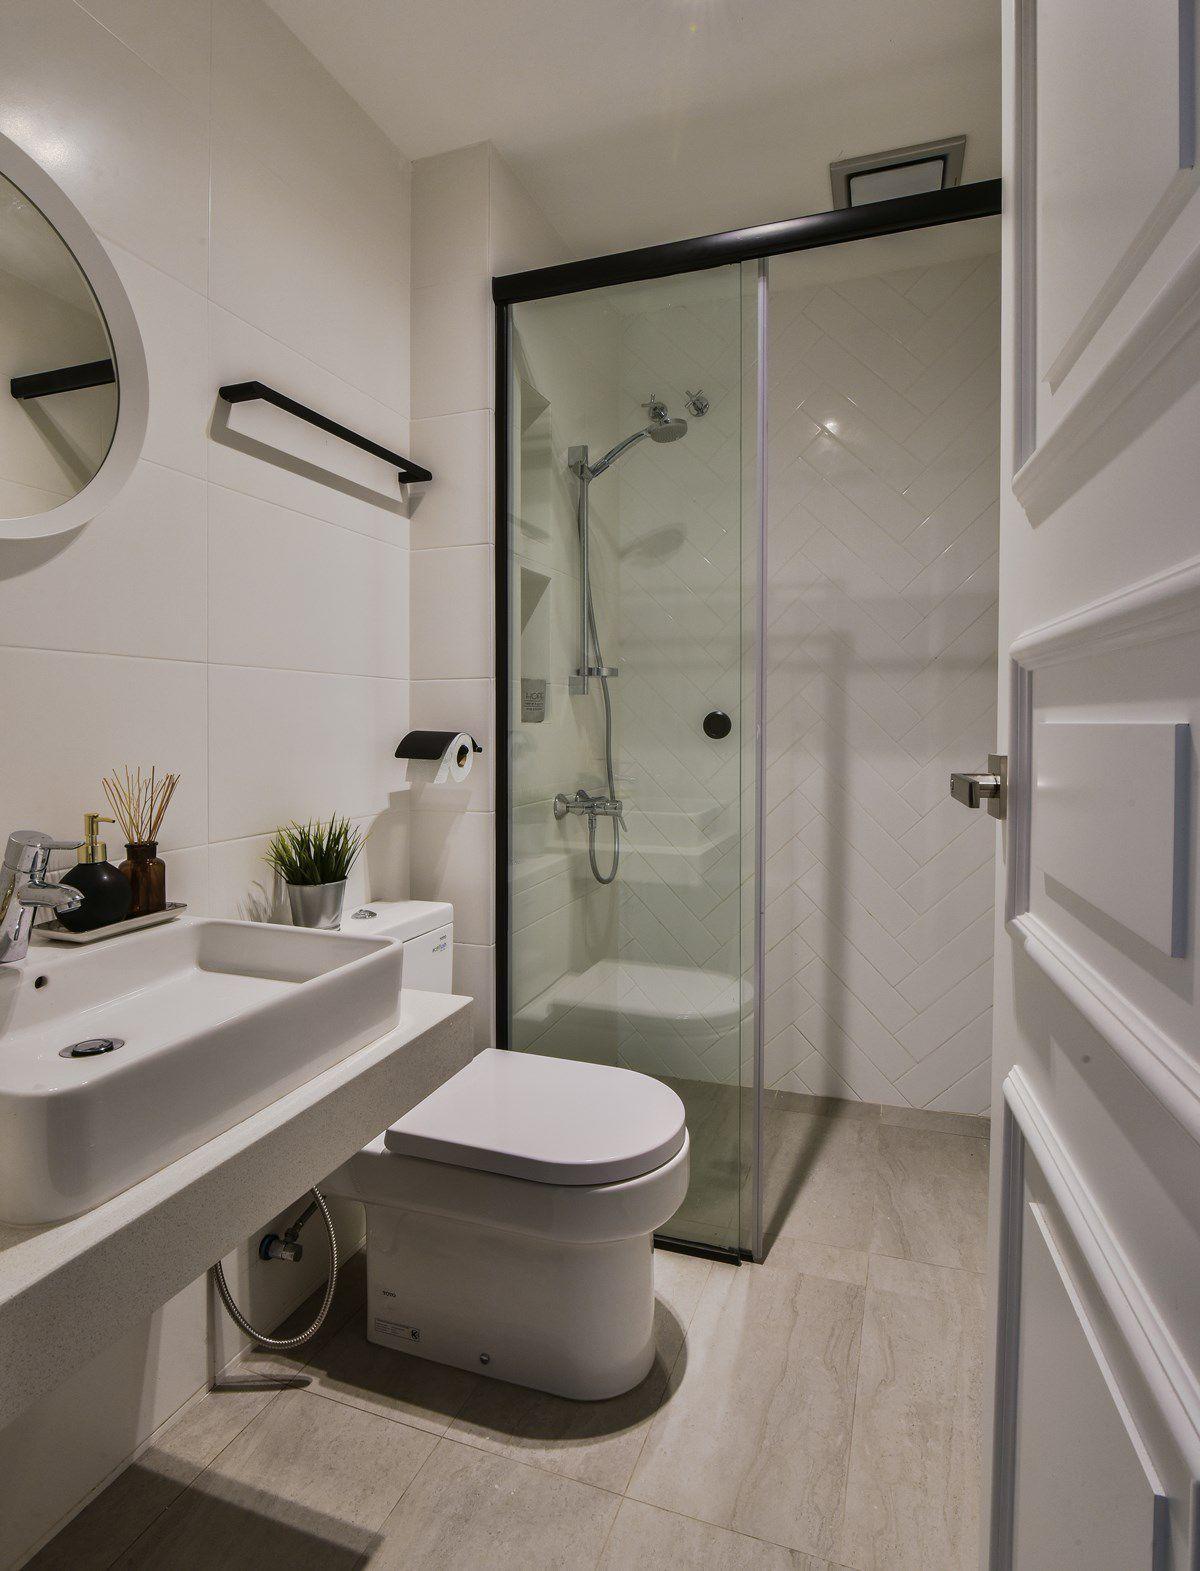 Bathroom Designs For Small Bathrooms In India Simple Bathroom Designs Interior Design Bathroom Small Bathroom Interior Design